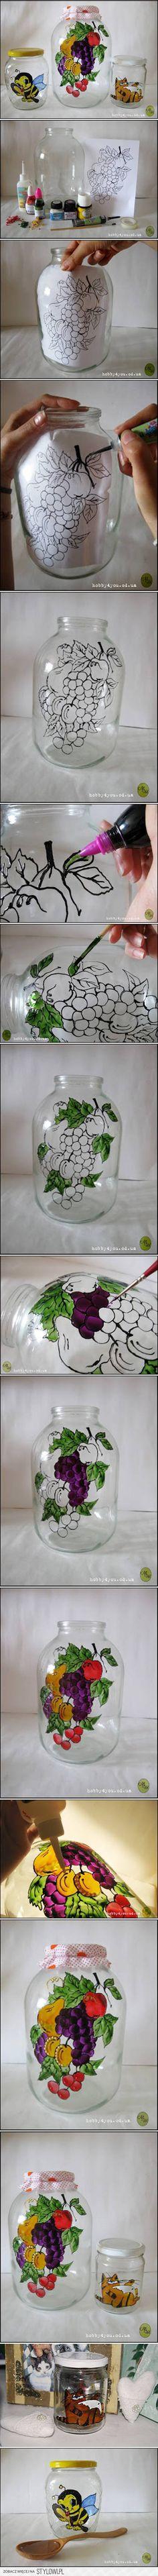 DIY Jar Painting Decor DIY Projects   UsefulDIY.com na Stylowi.pl